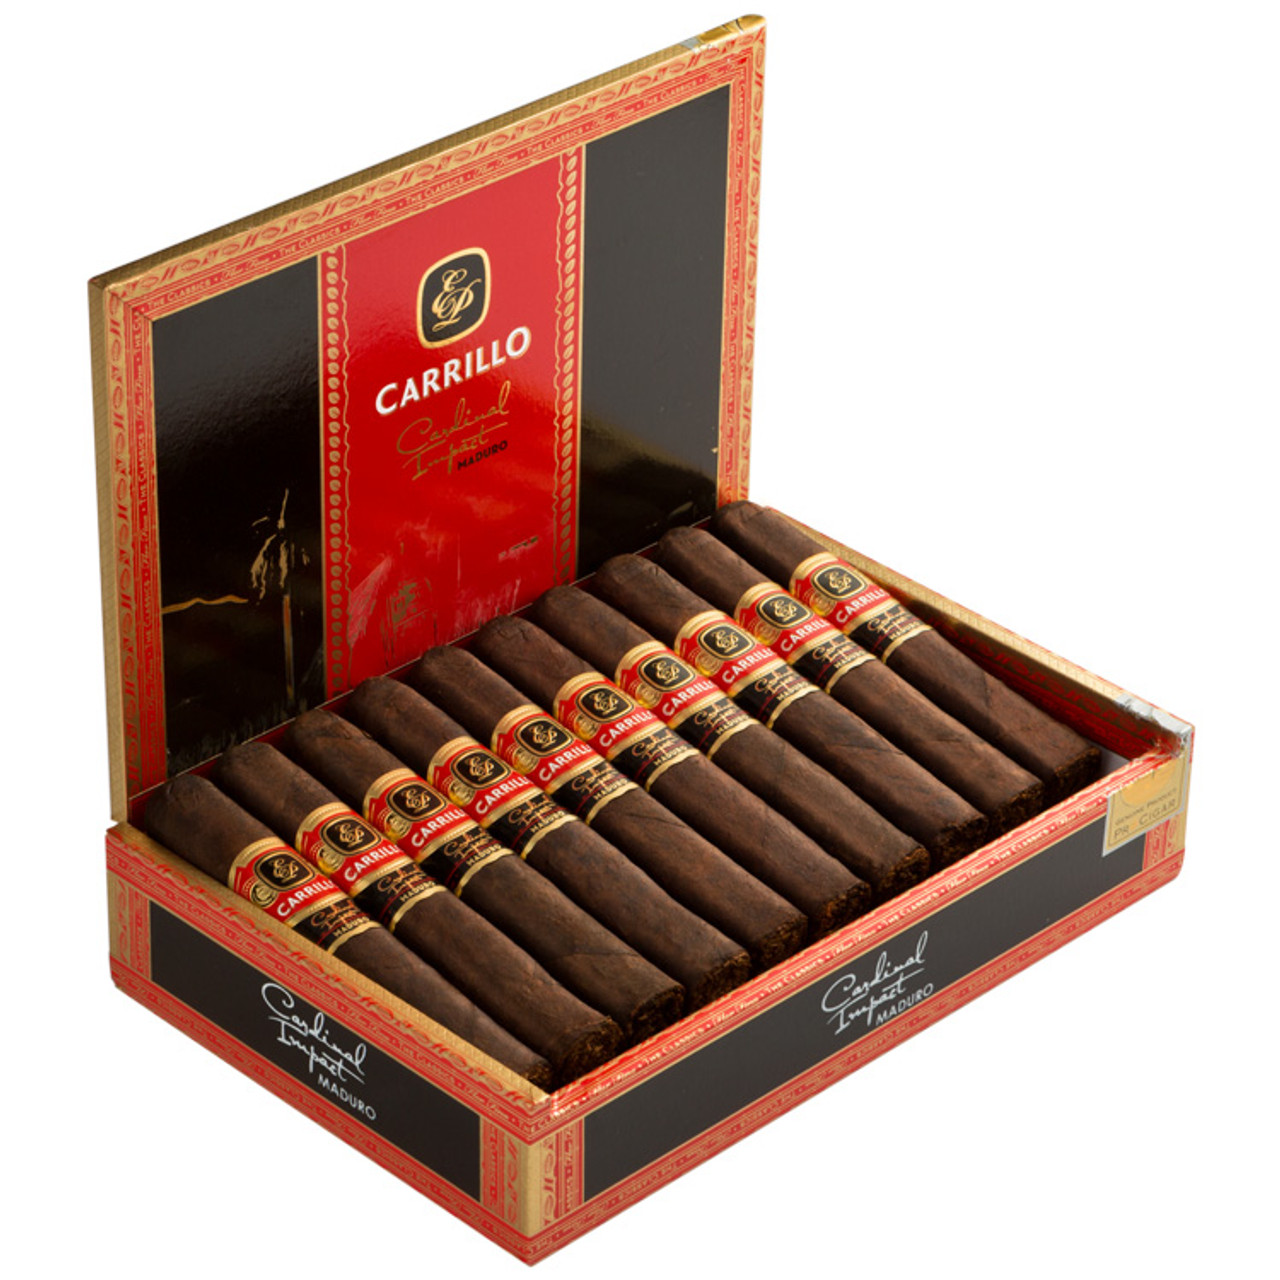 E.P. Carrillo Cardinal Impact No 54 Maduro Cigars - 6 x 54 (Box of 20)